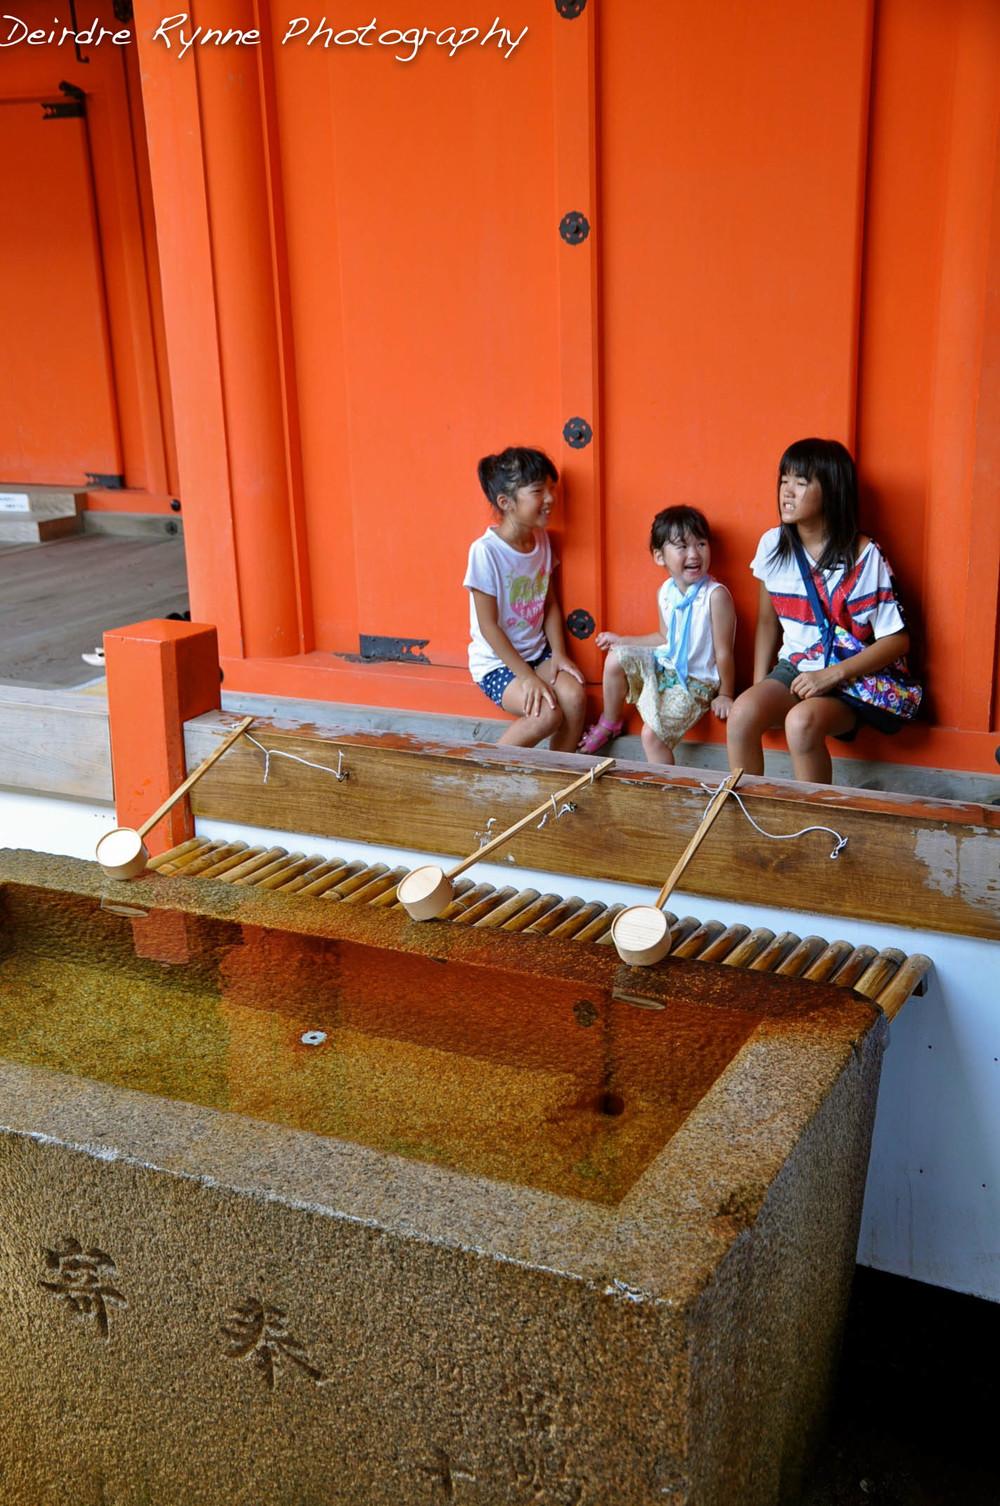 Itsukushima Shrine, Mt. Misen, Hiroshima Prefecture, Japan. July 2012